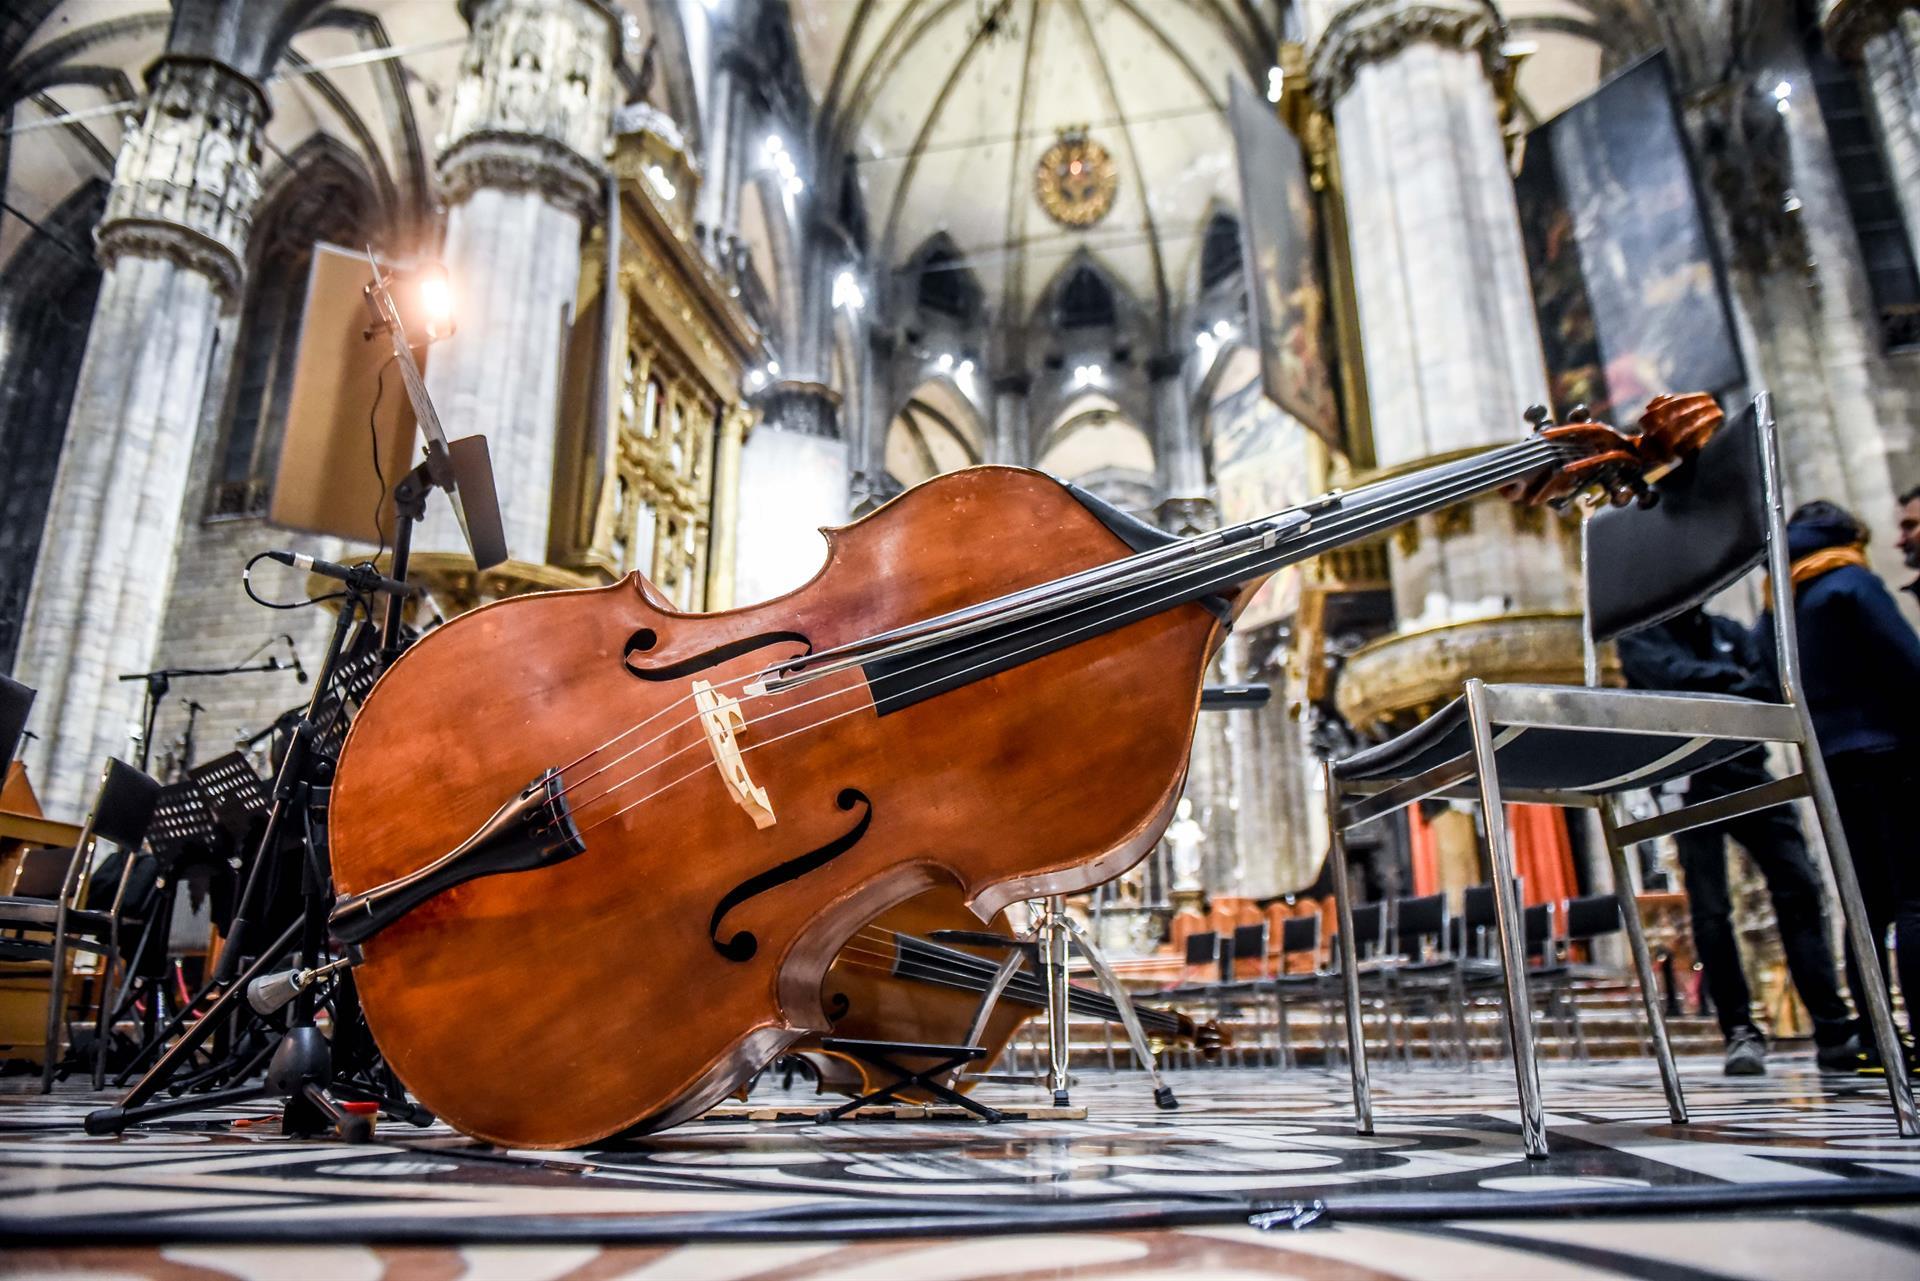 © Veneranda Fabbrica Del Duomo Di Milano Musica In Duomo 3